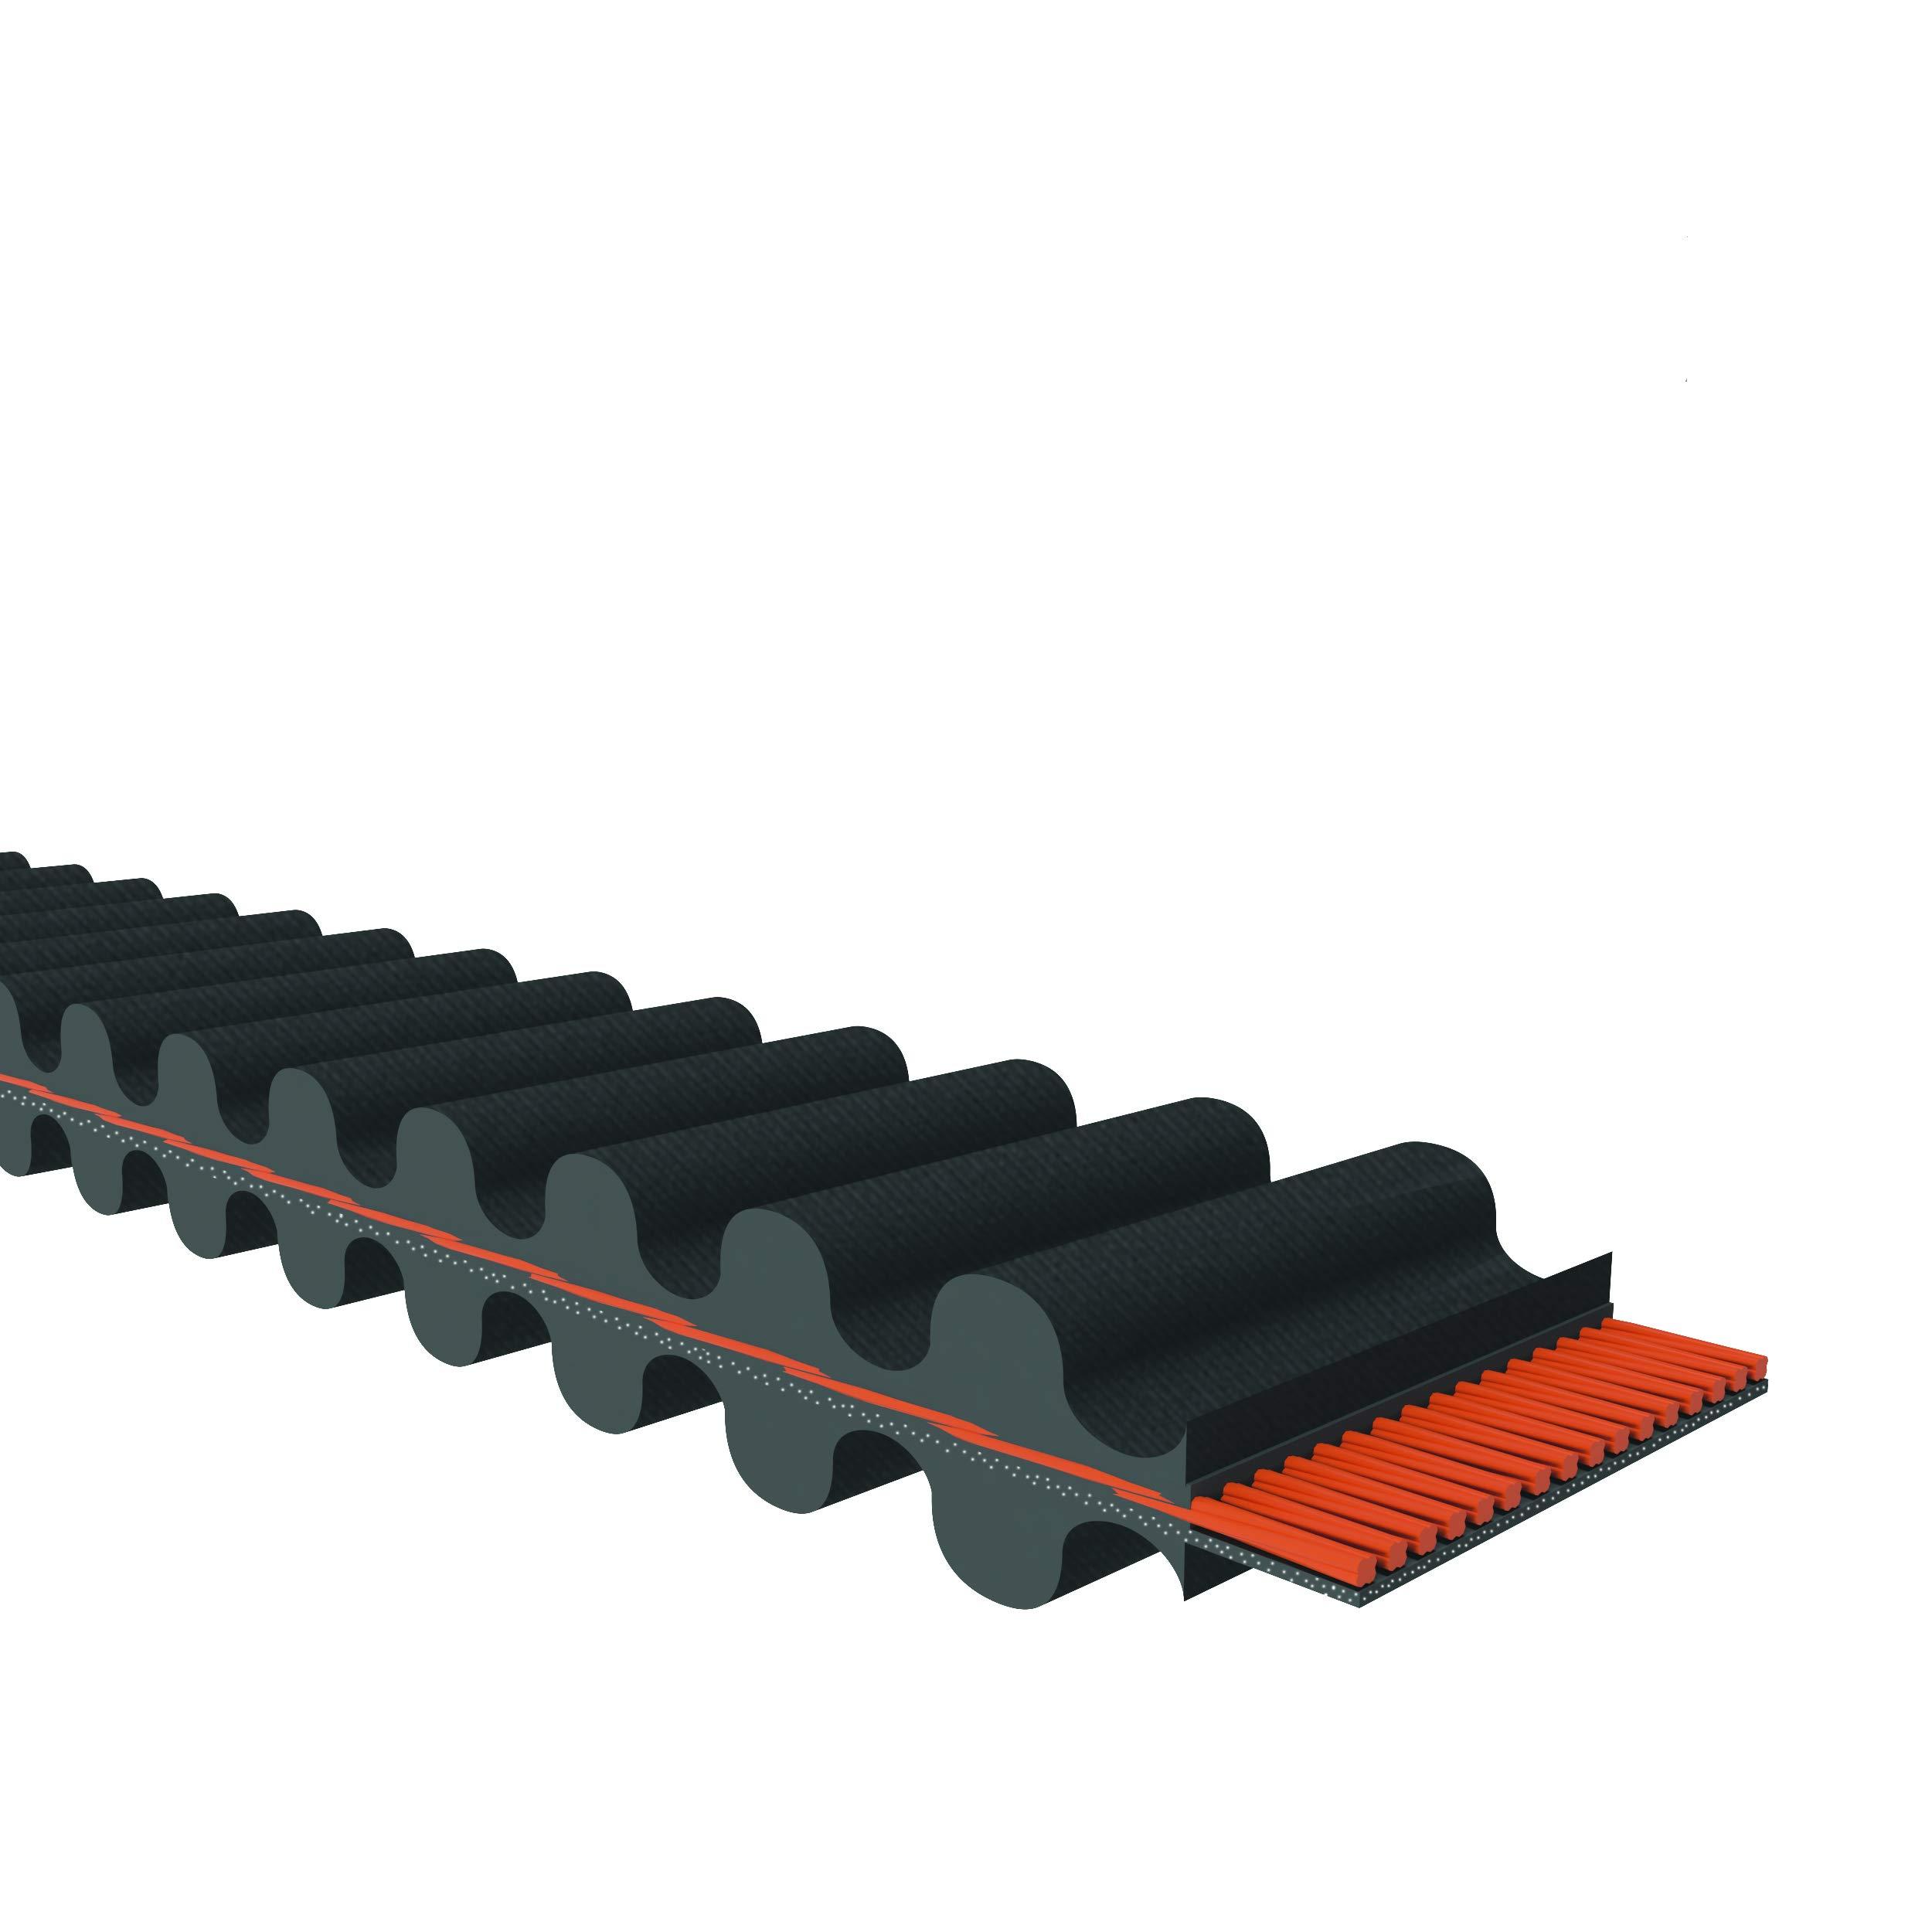 Megadyne D1600-8M-20 doble cara Correa Dentada 8mm Pitch 200 dientes 20 W